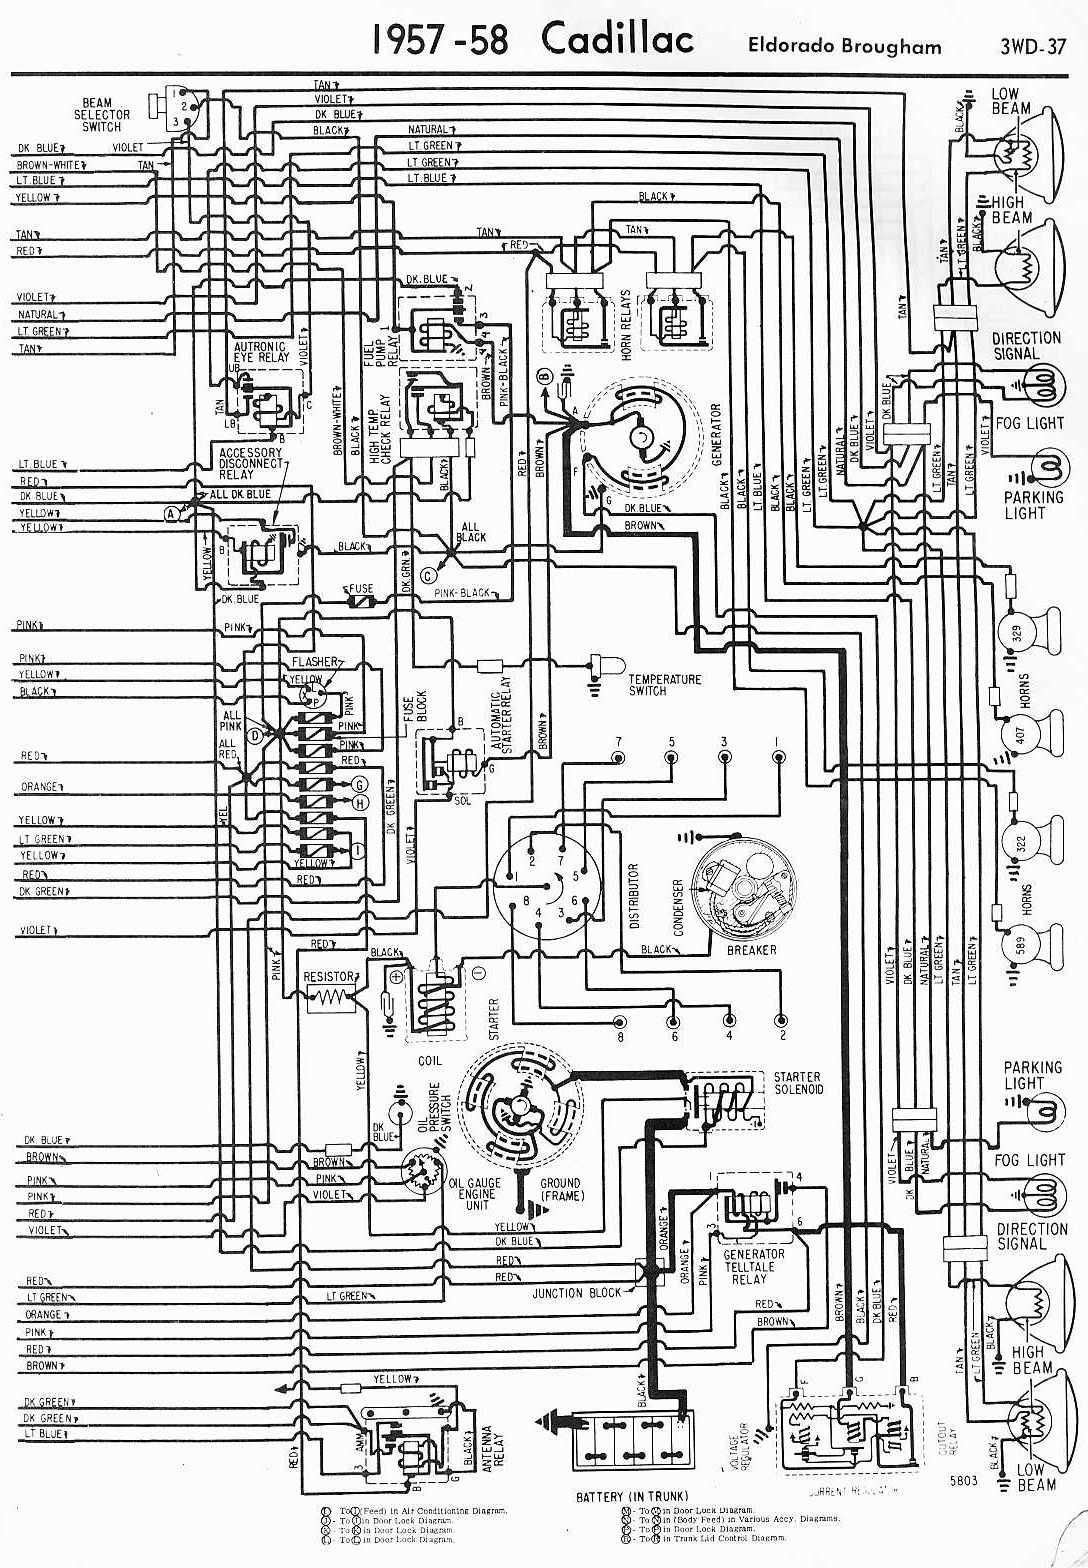 CADILLAC - Car PDF Manual, Wiring Diagram & Fault Codes DTC automotive-manuals.net